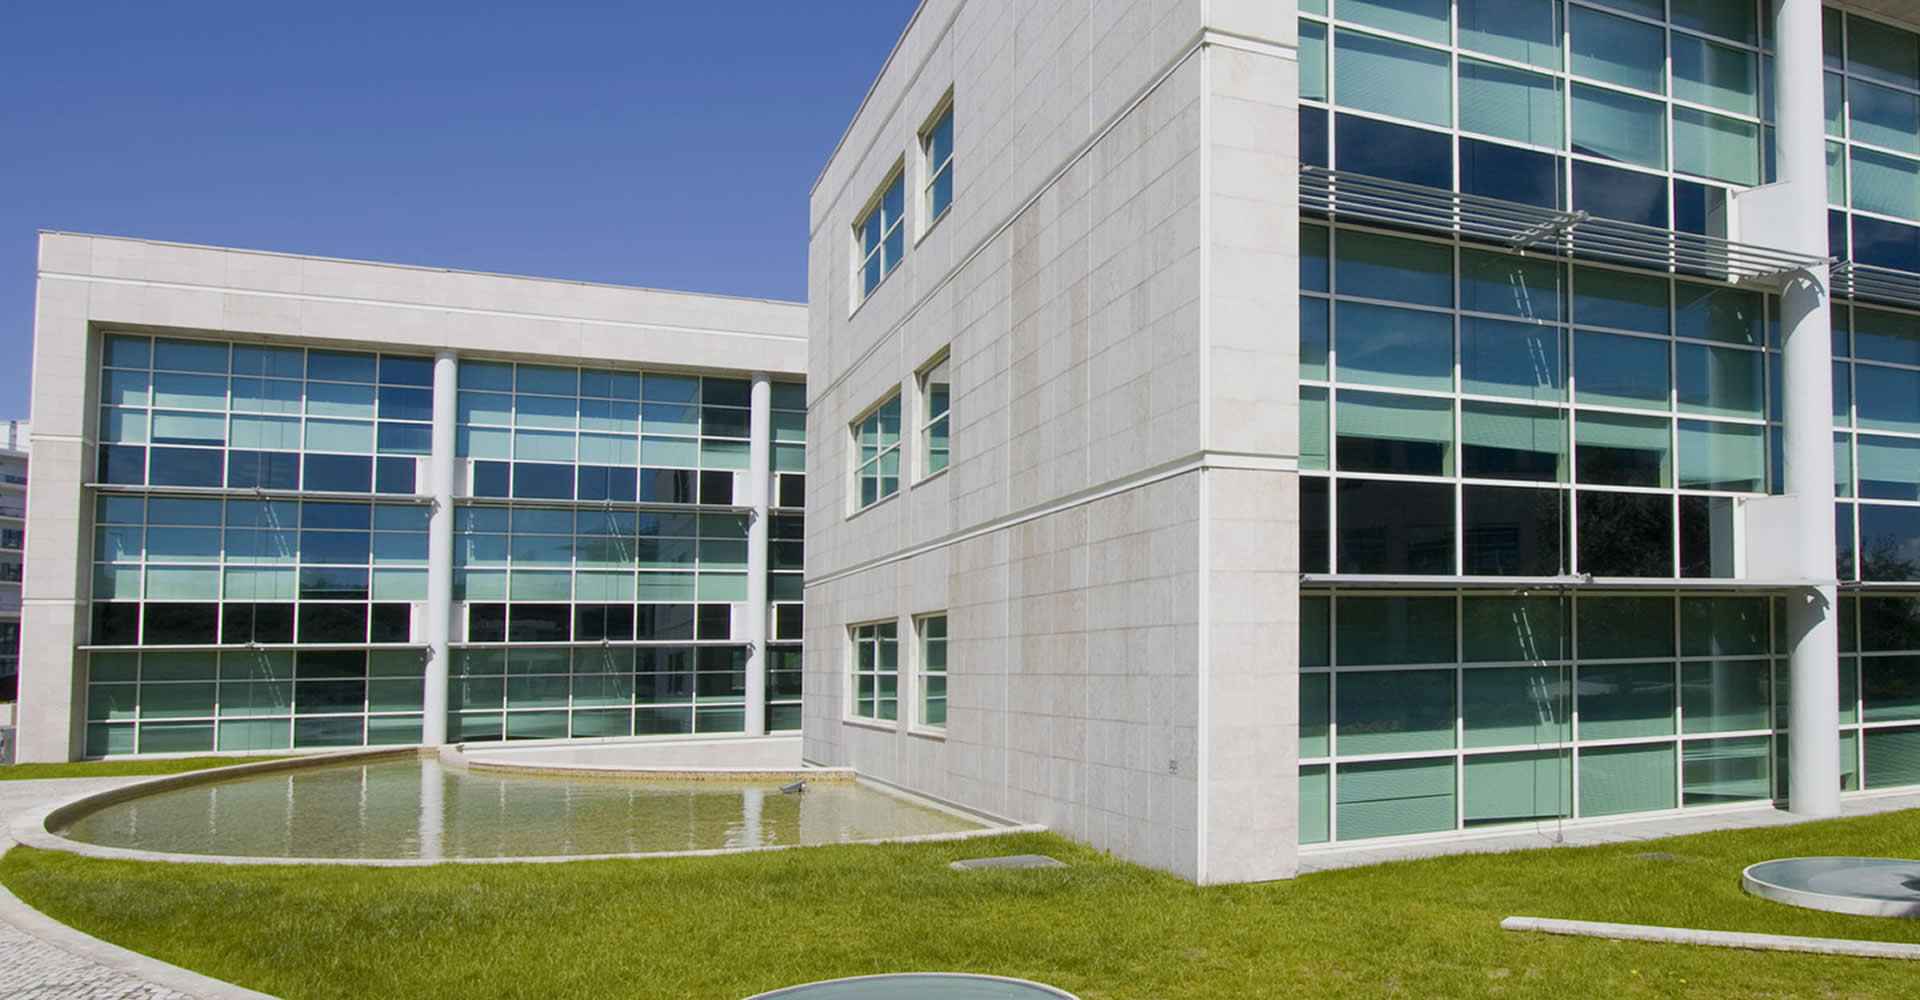 Estudio de arquitectura en getafe arquitectos en getafe - Estudios de arquitectura coruna ...